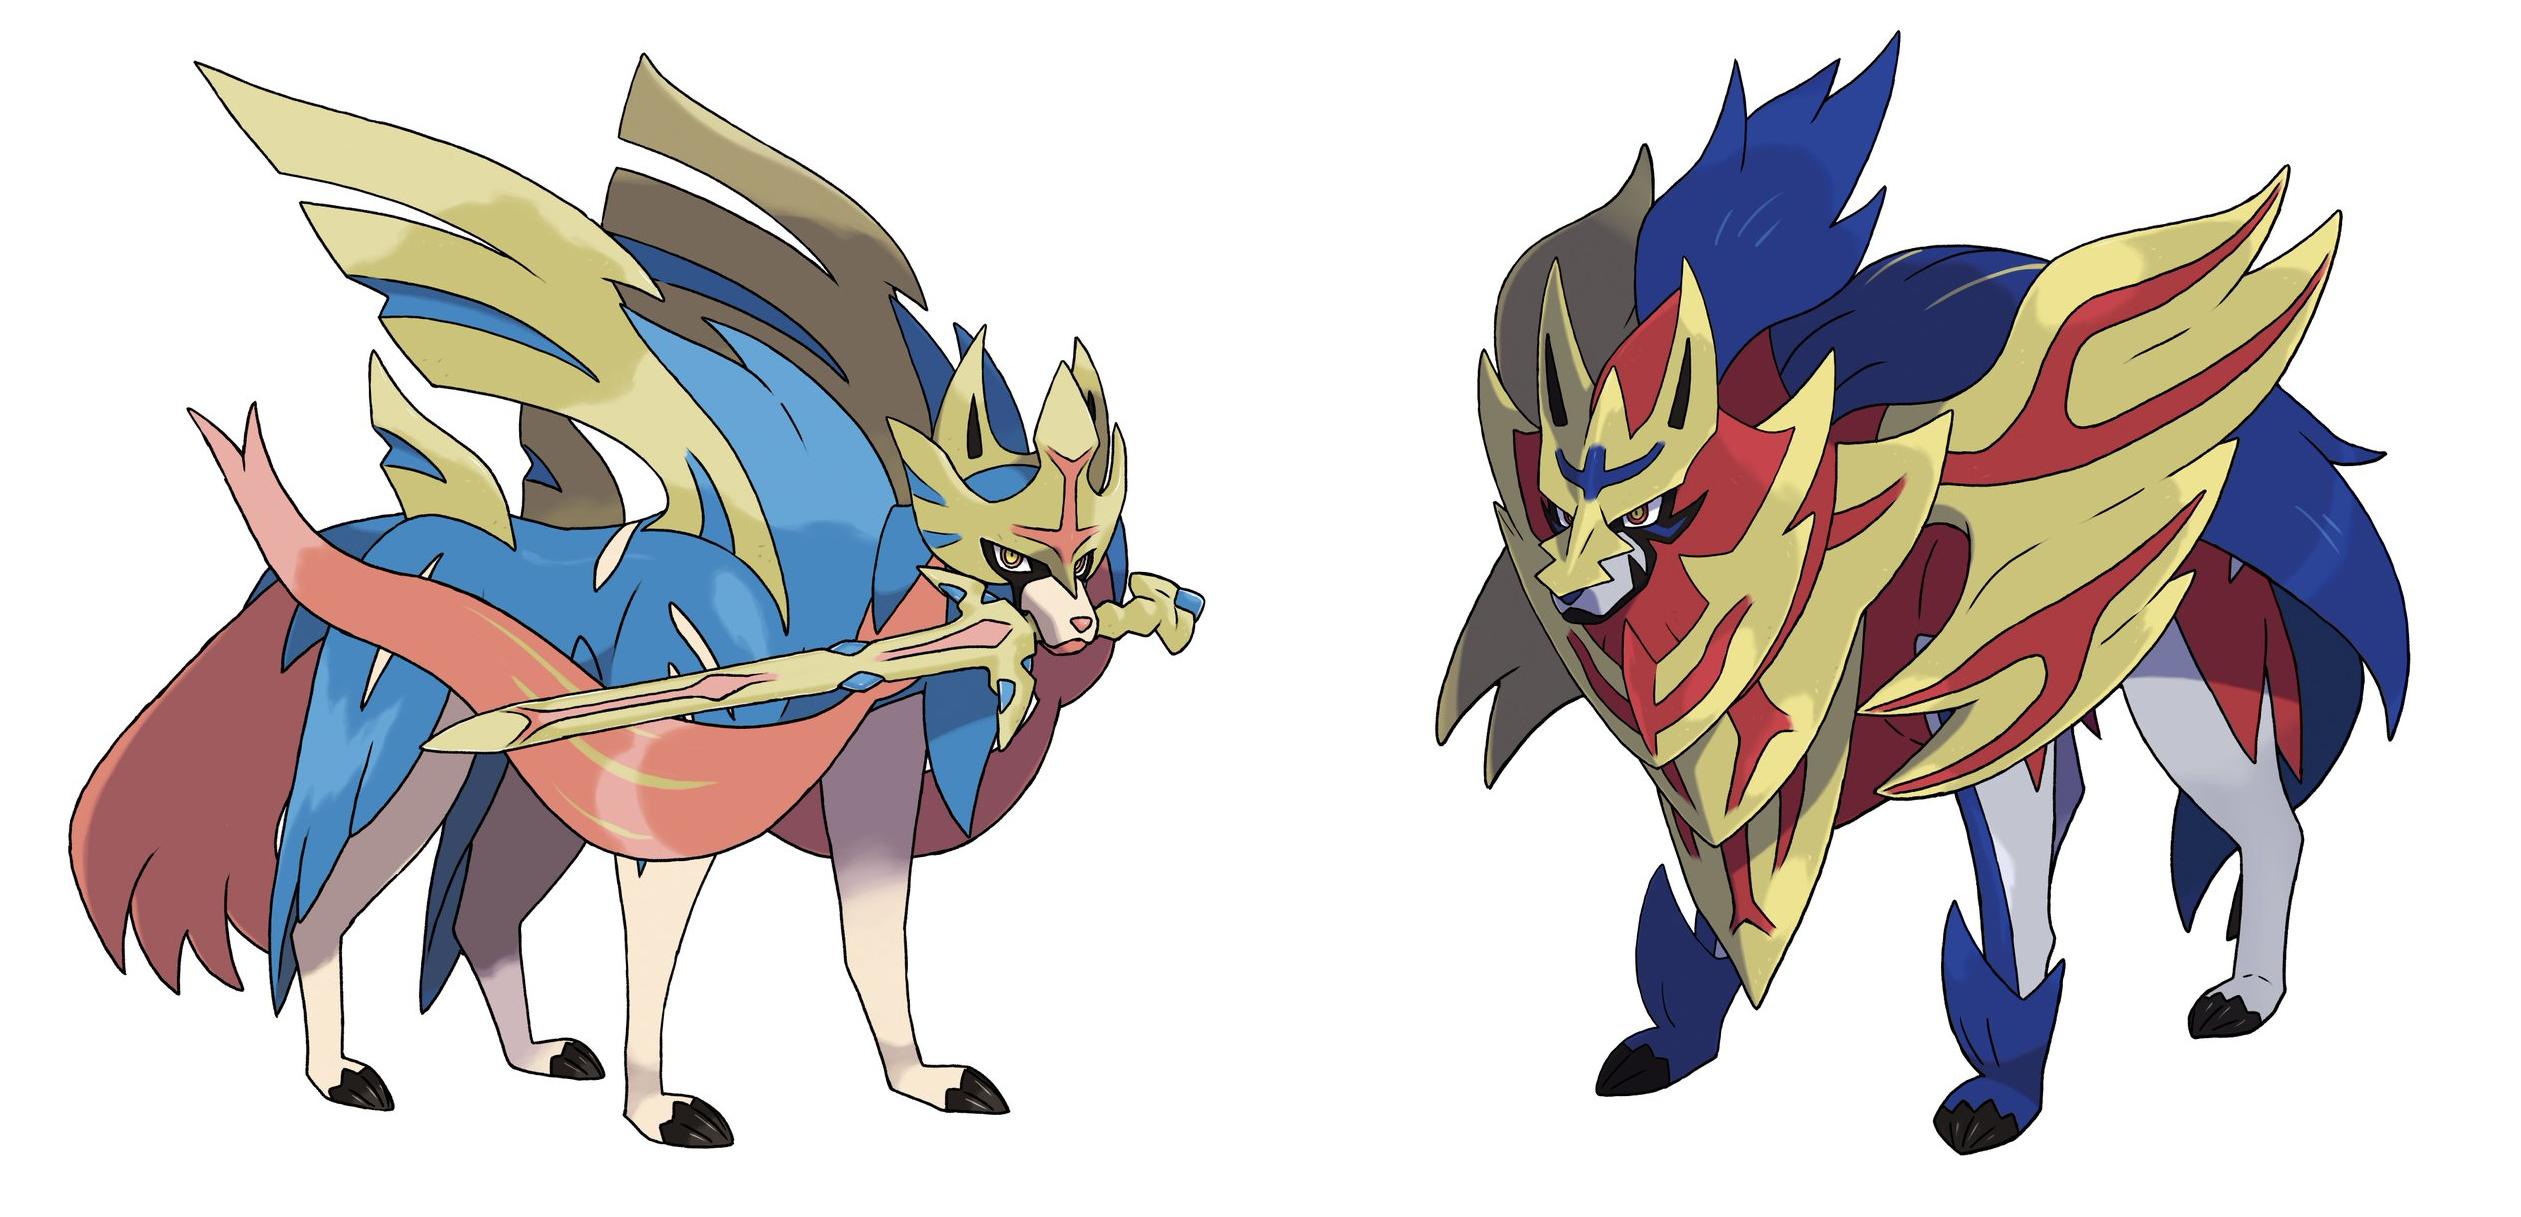 Official Art Of Main Legendaries Zacian And Zamazenta Pokemon